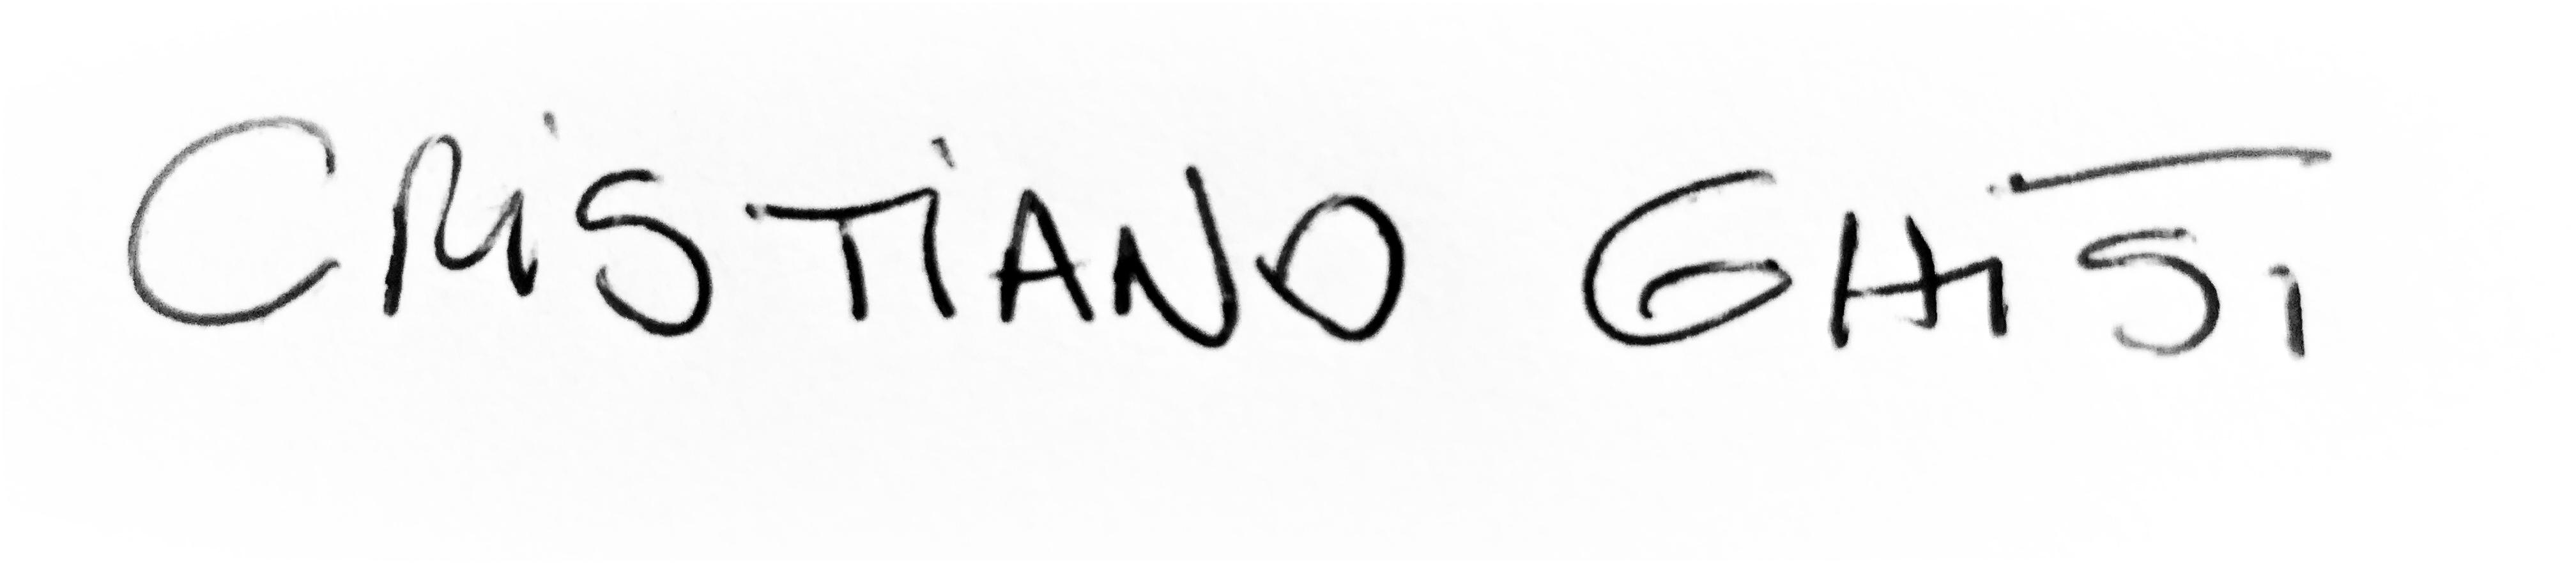 assinatura_blank